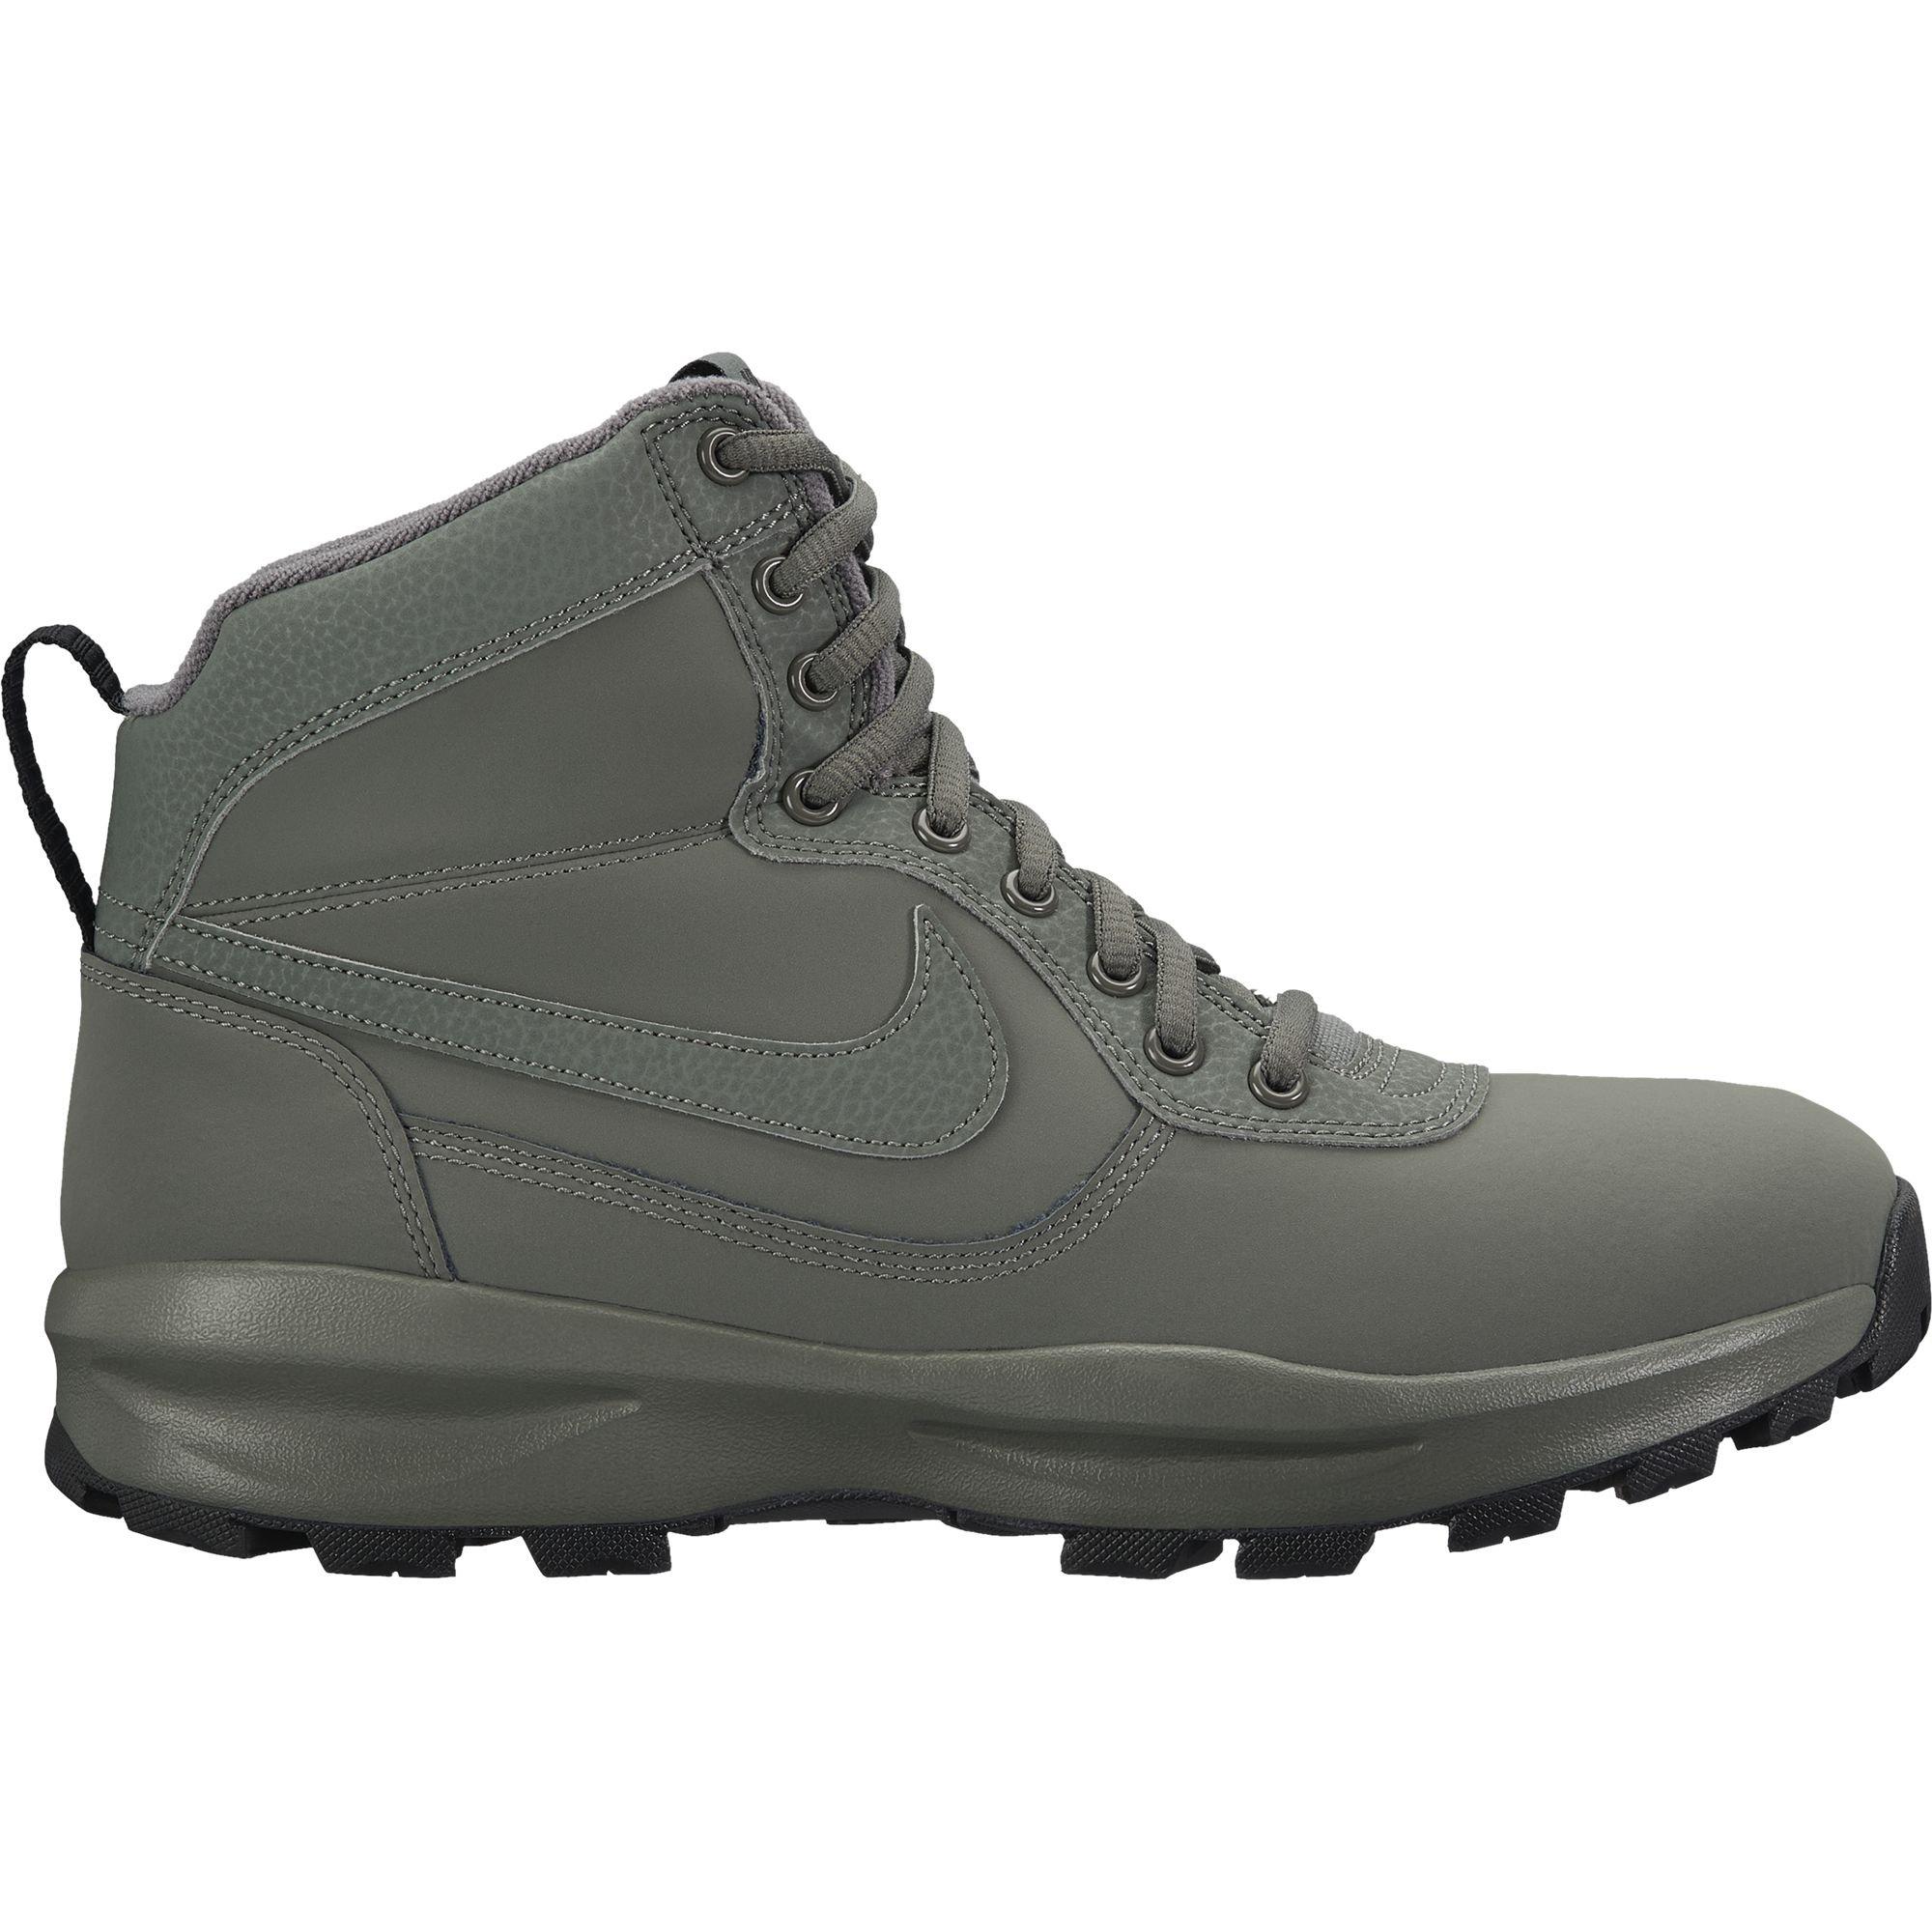 28f464dad1b Galleon - Nike Mens Manoadome Leather Boots River Rock/Black 844358 ...